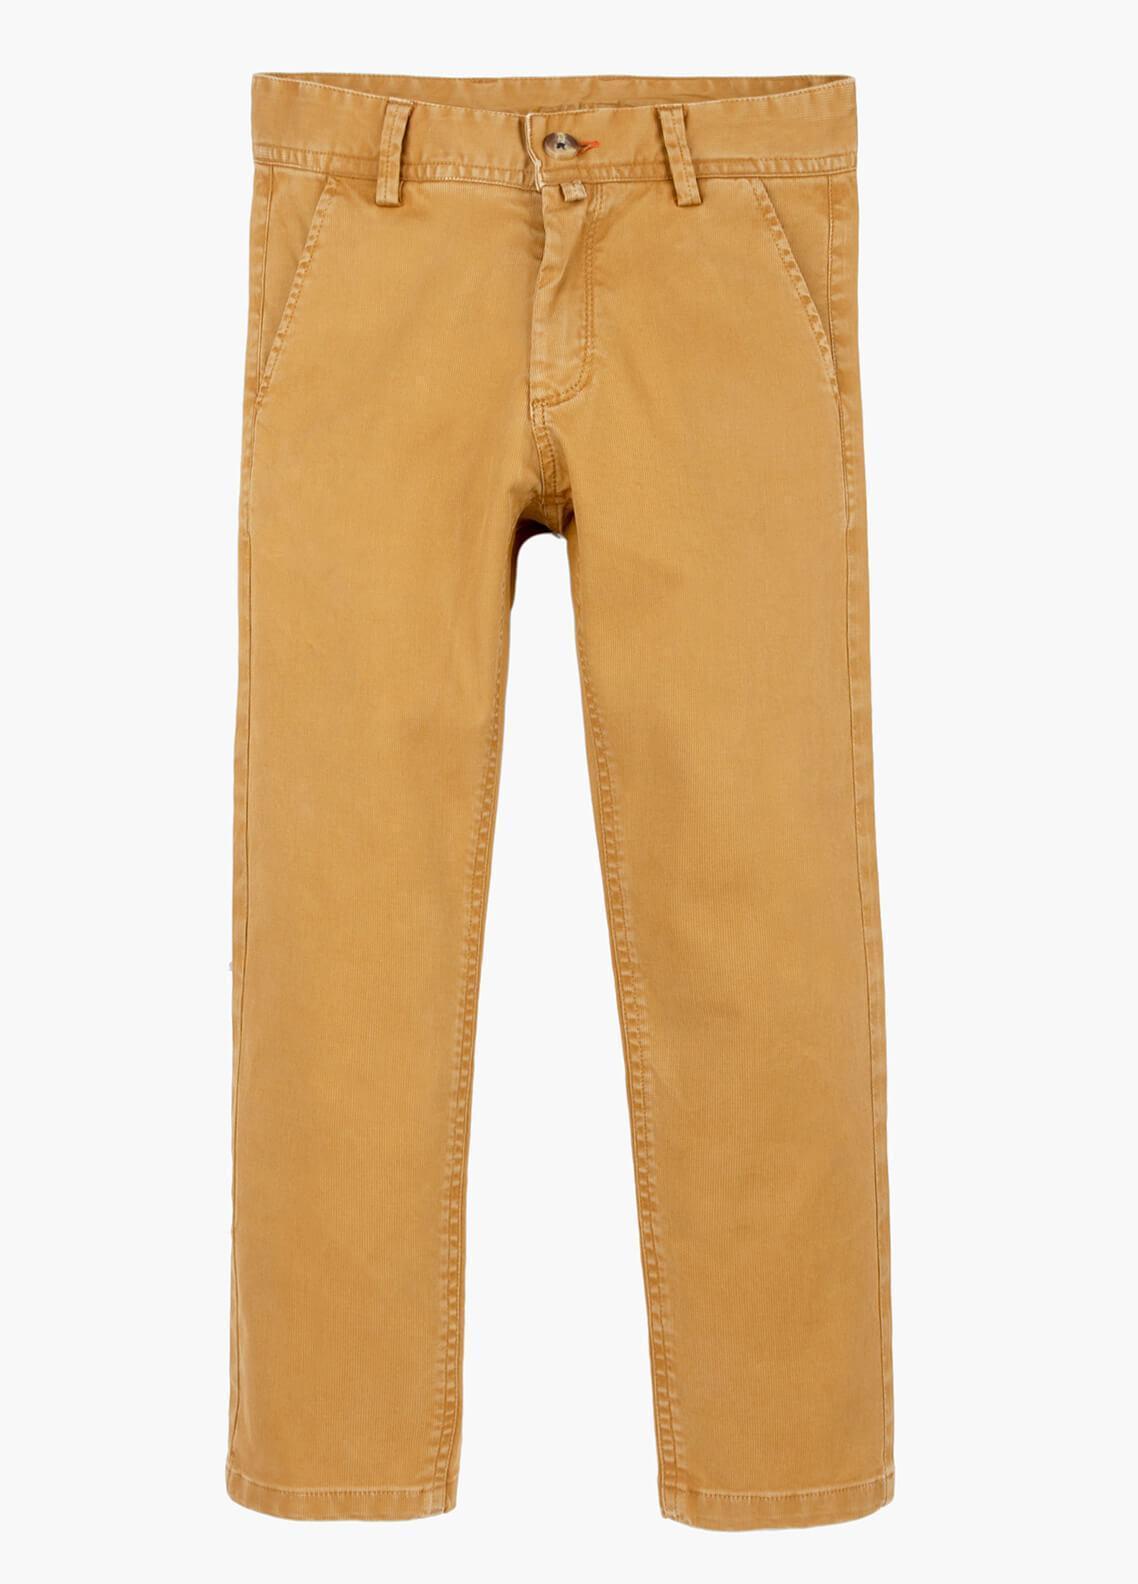 Brumano Cotton Casual Boys Trousers -  BRM-555-Copper